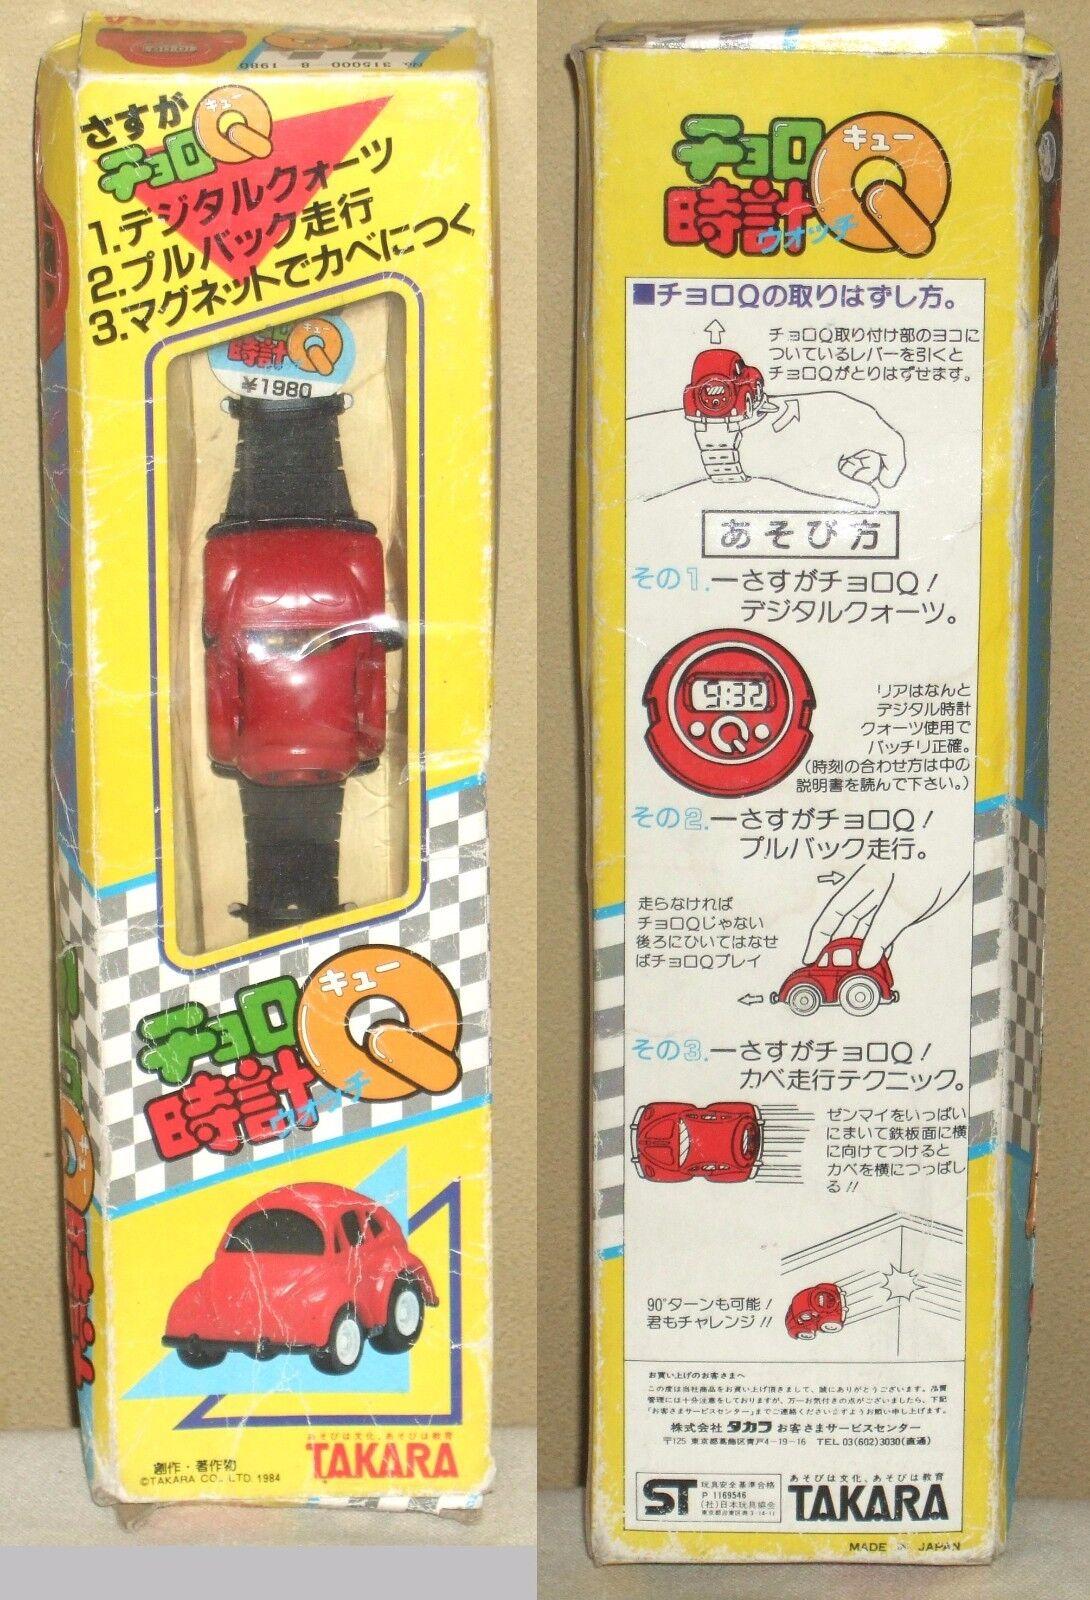 Watch Chgold Q Volkswagen VW Transformers Figure Dolls Takara 1984 Unused Rare